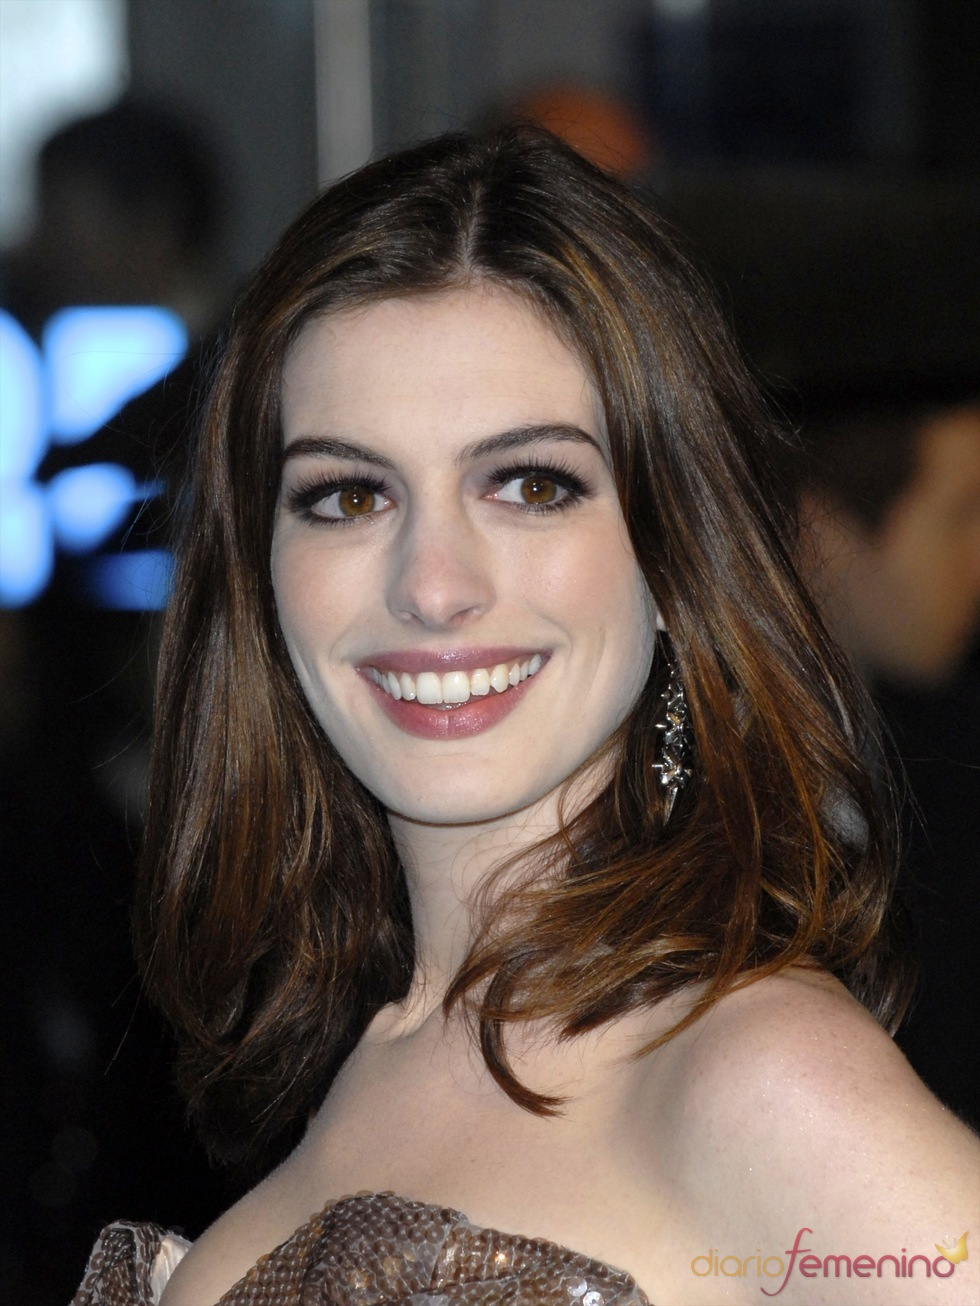 Anne Hathaway, sonrisa perfecta